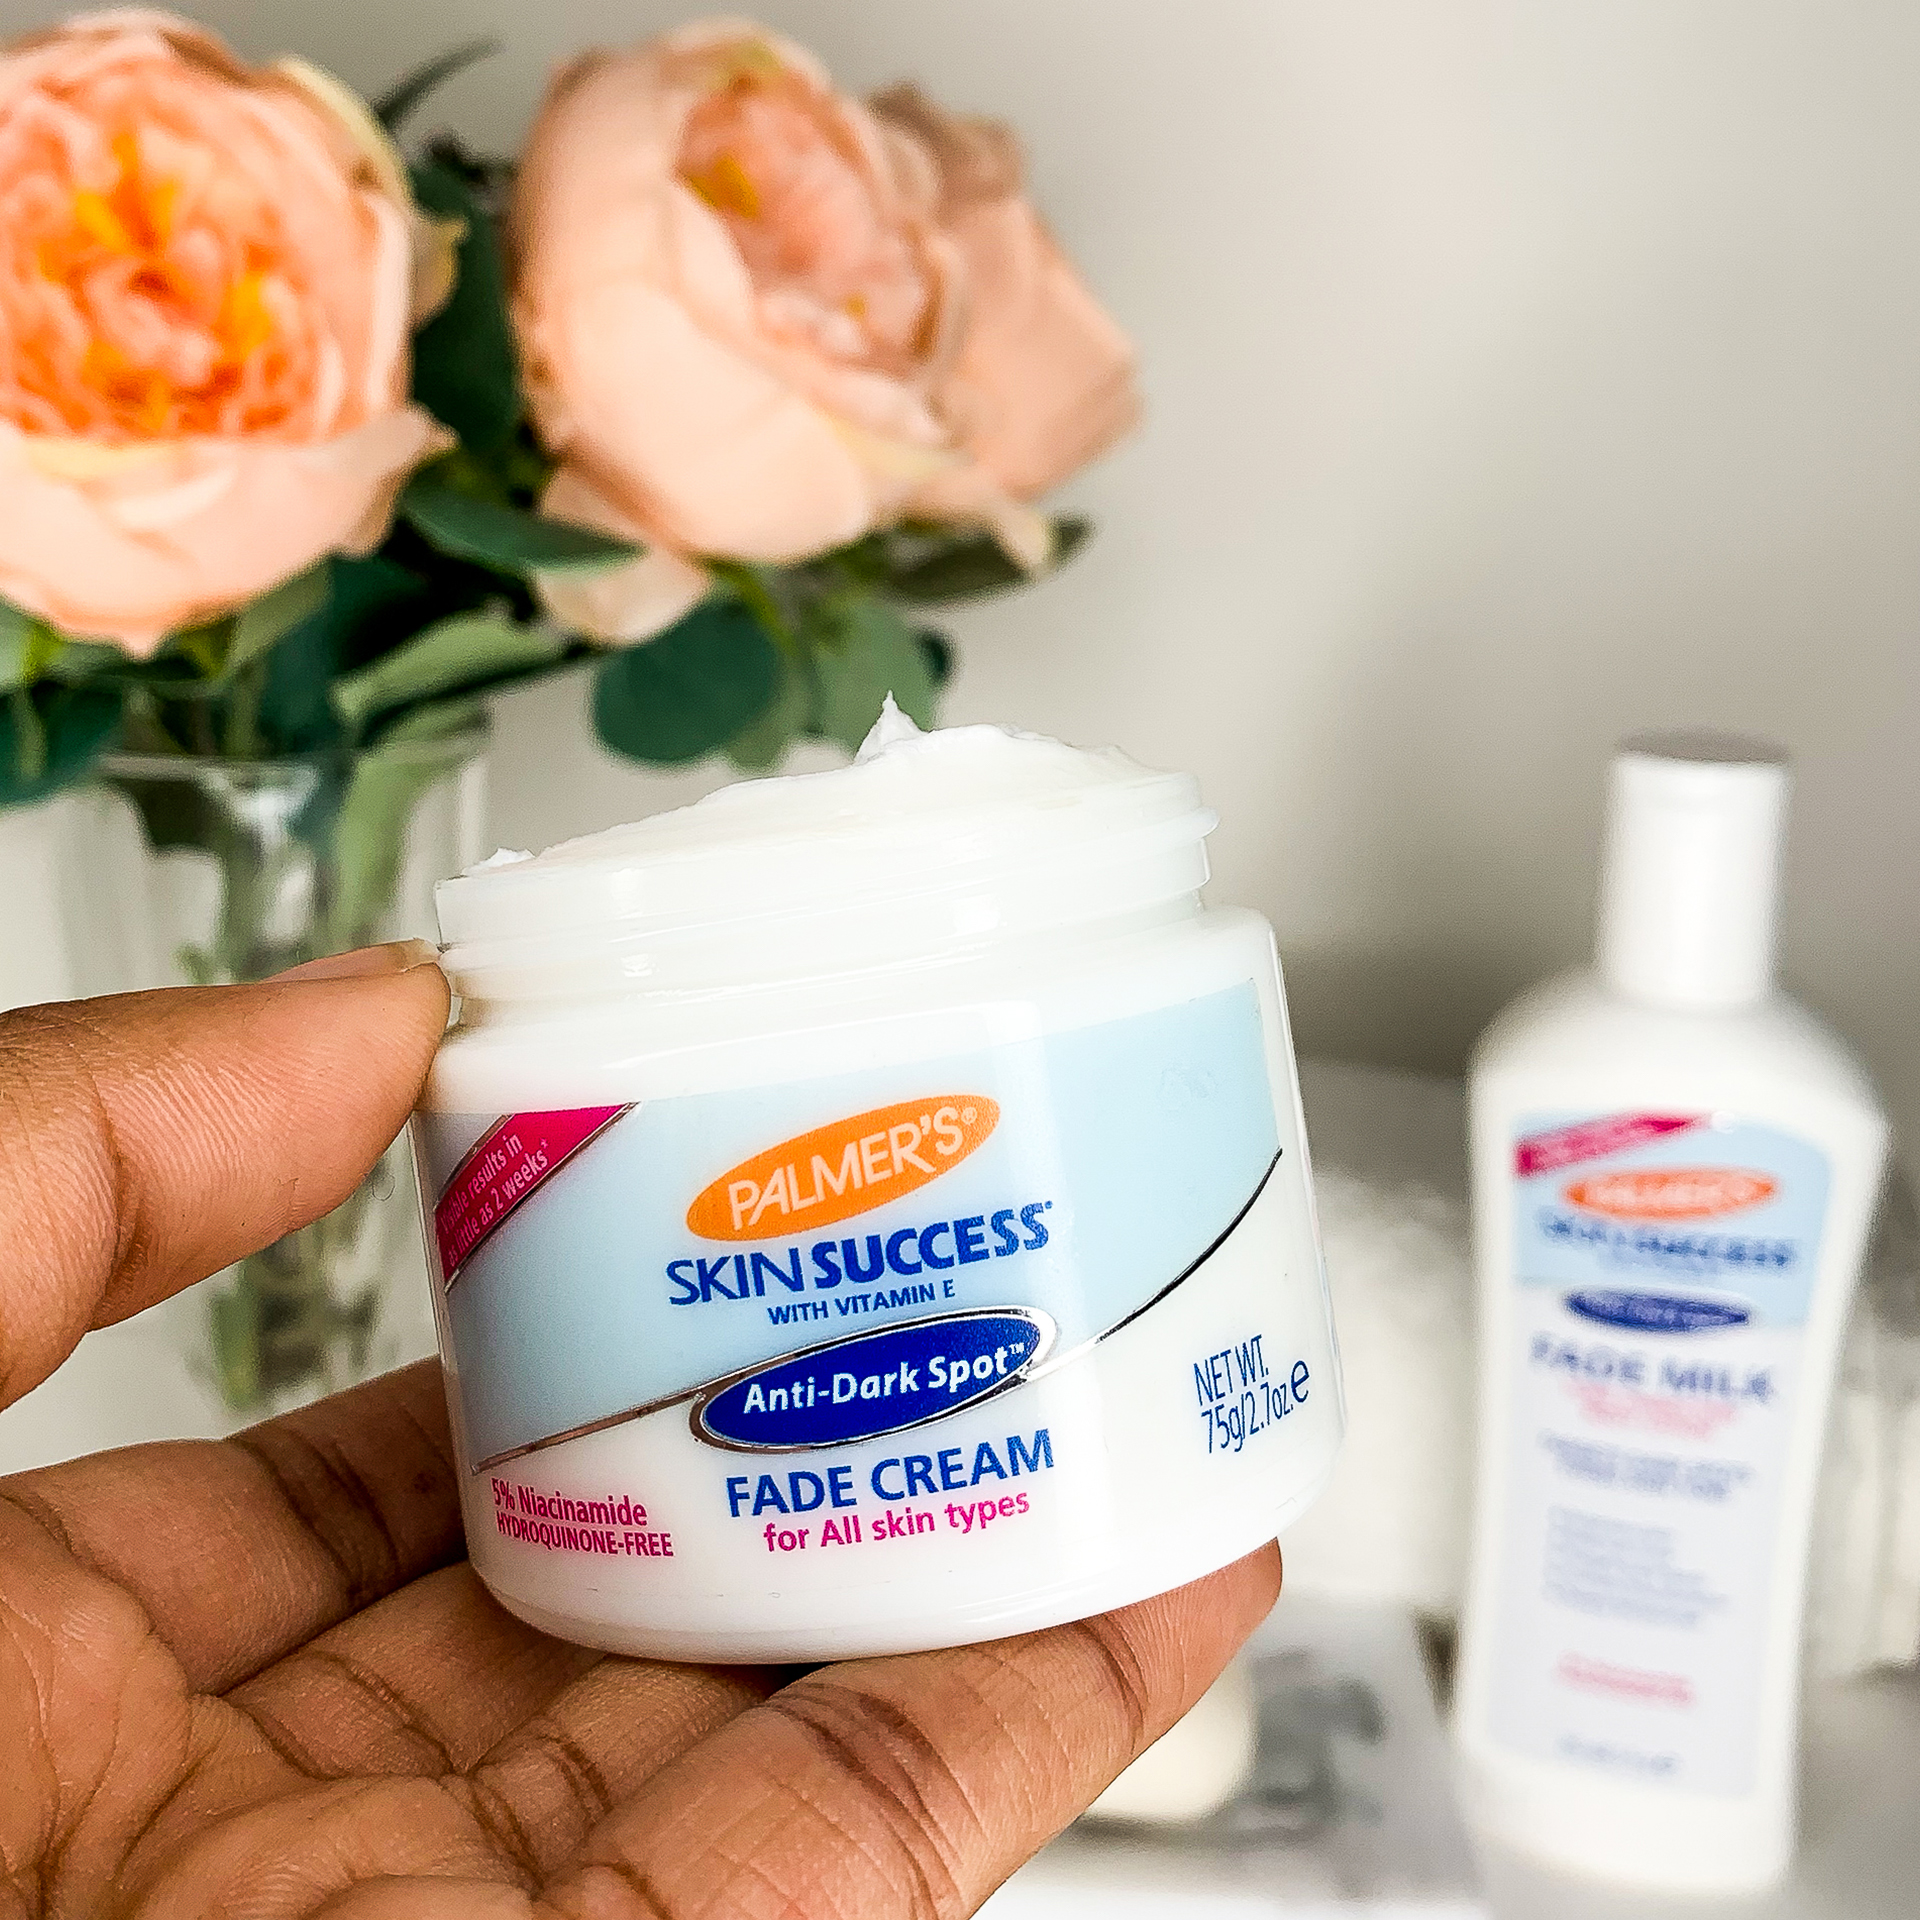 Palmer's Skin Success Anti-Dark Spot Fade Cream held in hand